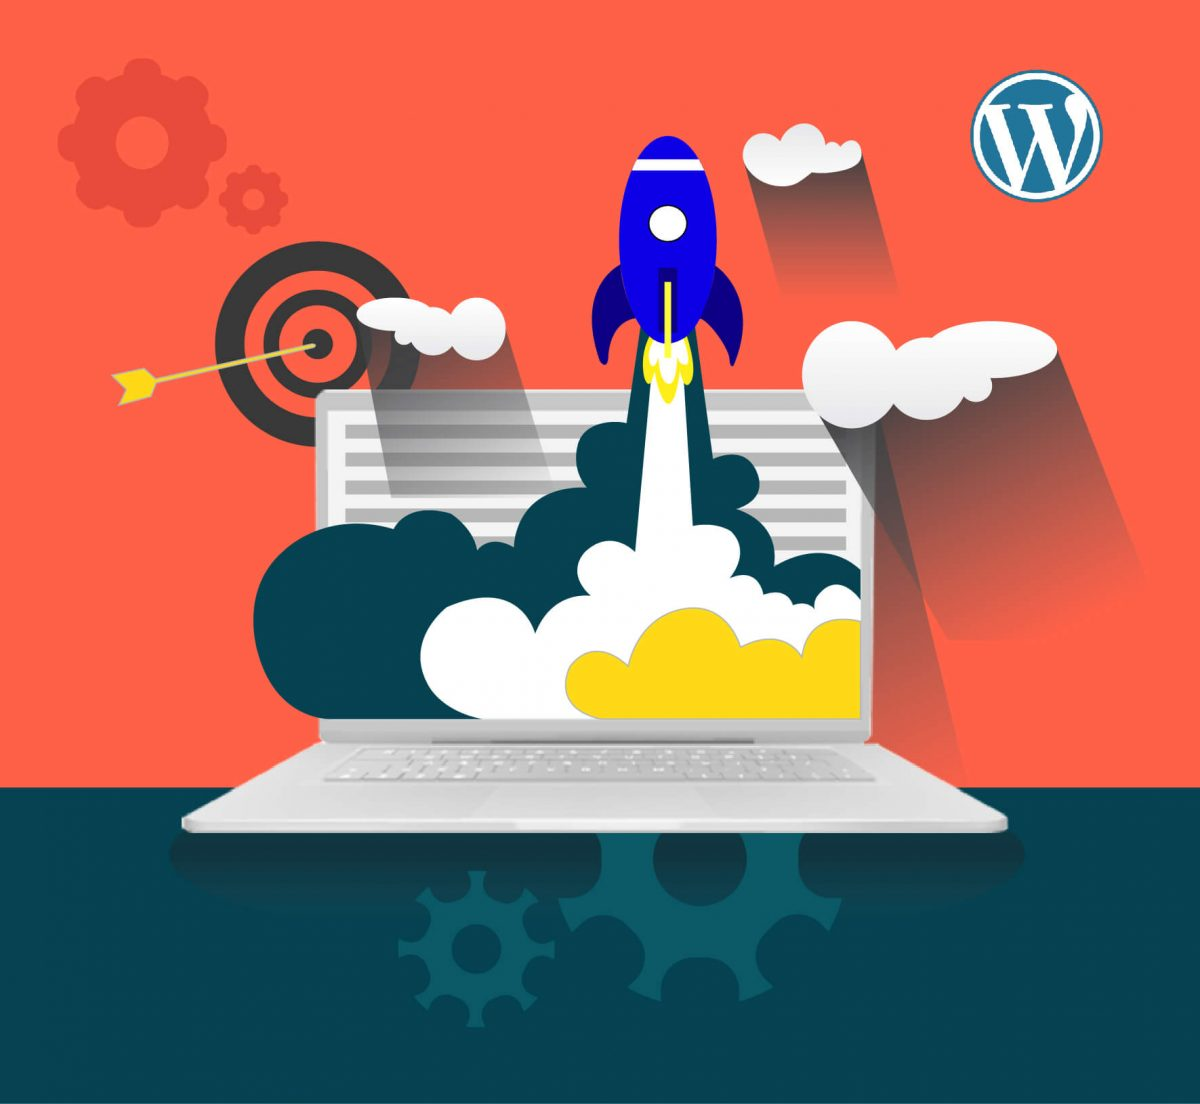 9 Things to do when launching a WordPress Website